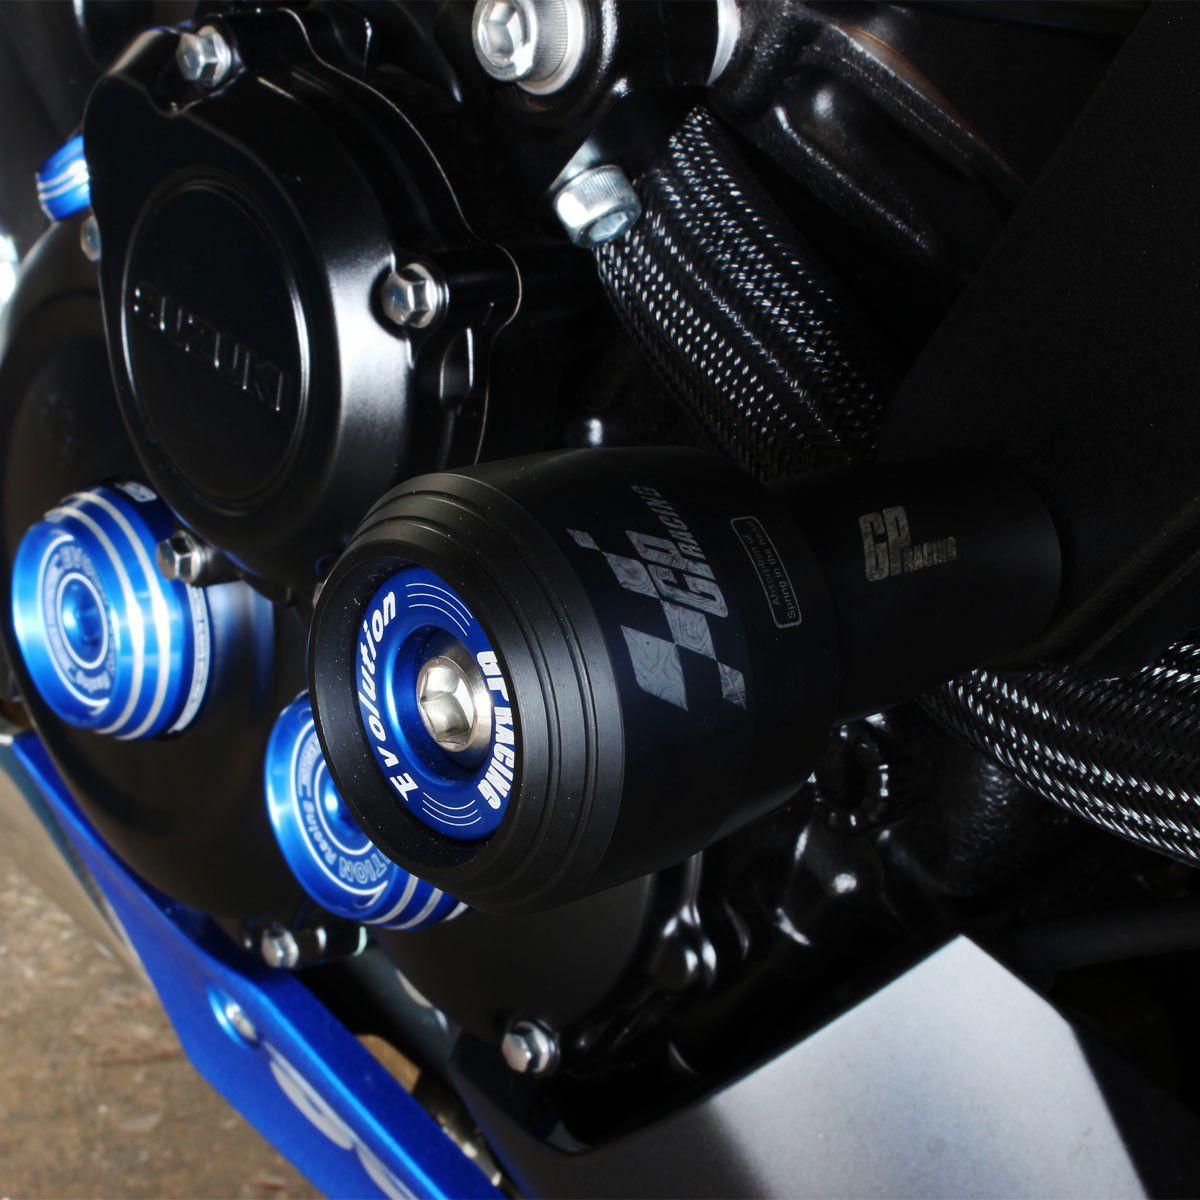 Slider Evolution GP Nylon XJ6F XJ XJ6 F 10 11 12 13 14 15 16